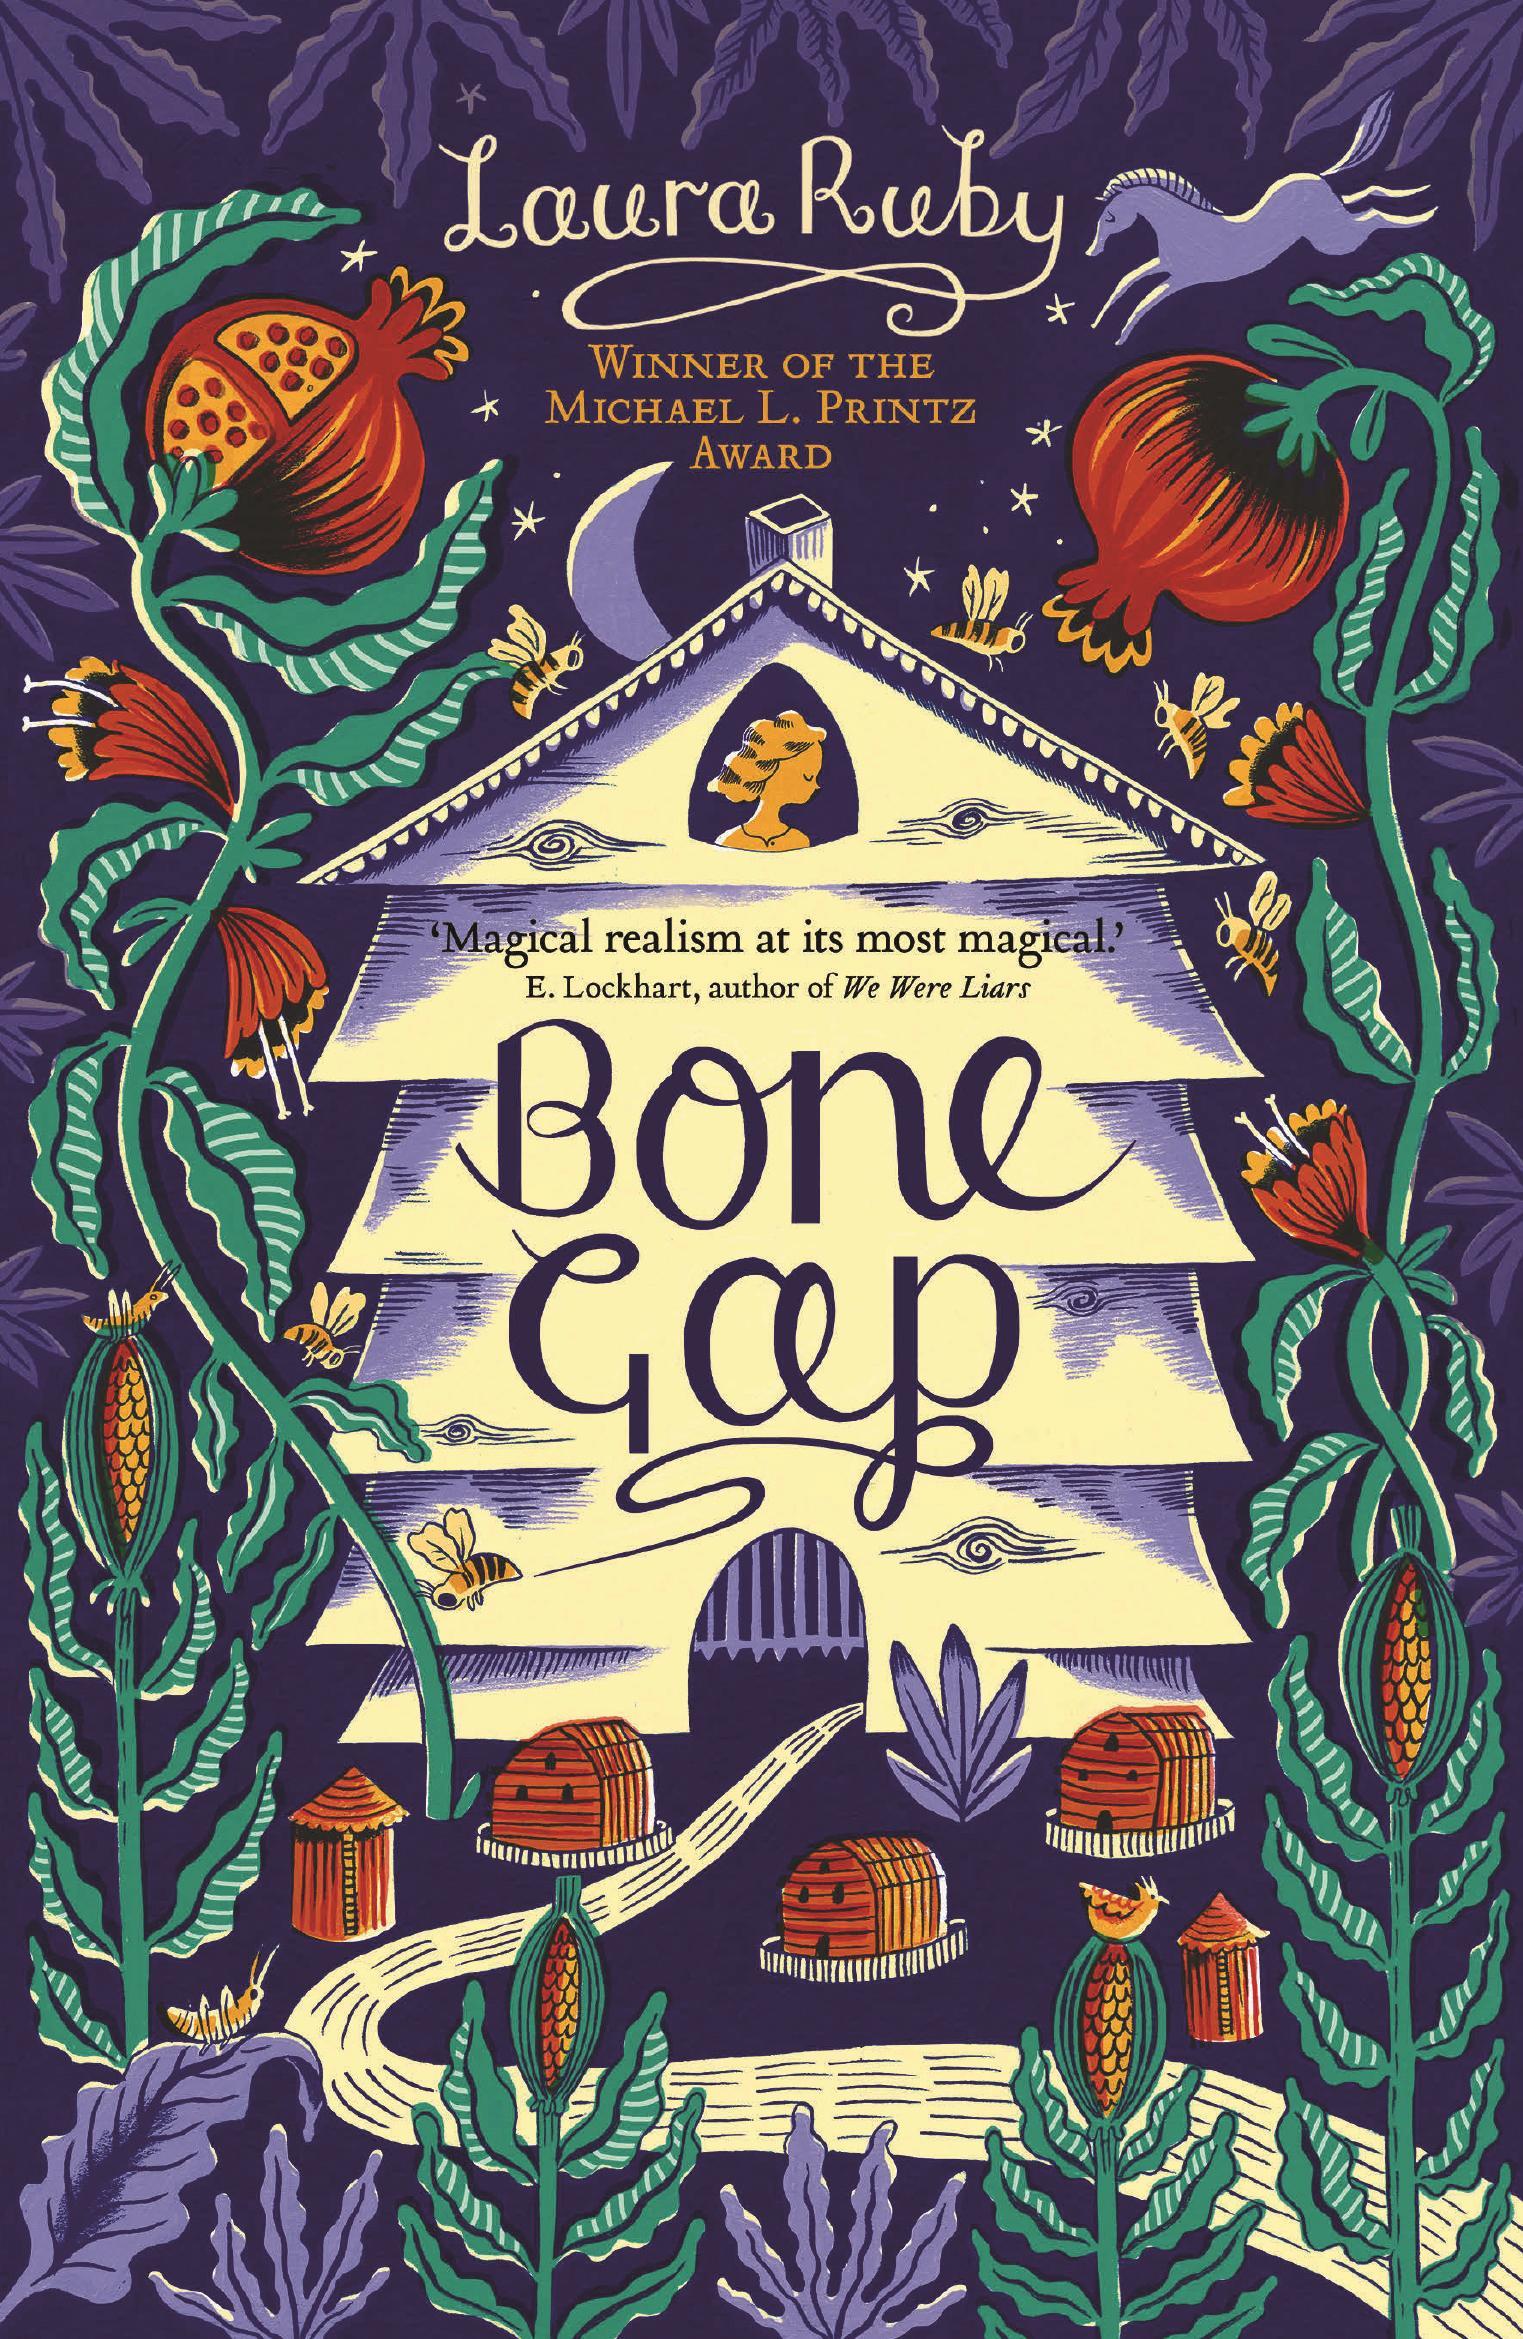 BoneGap